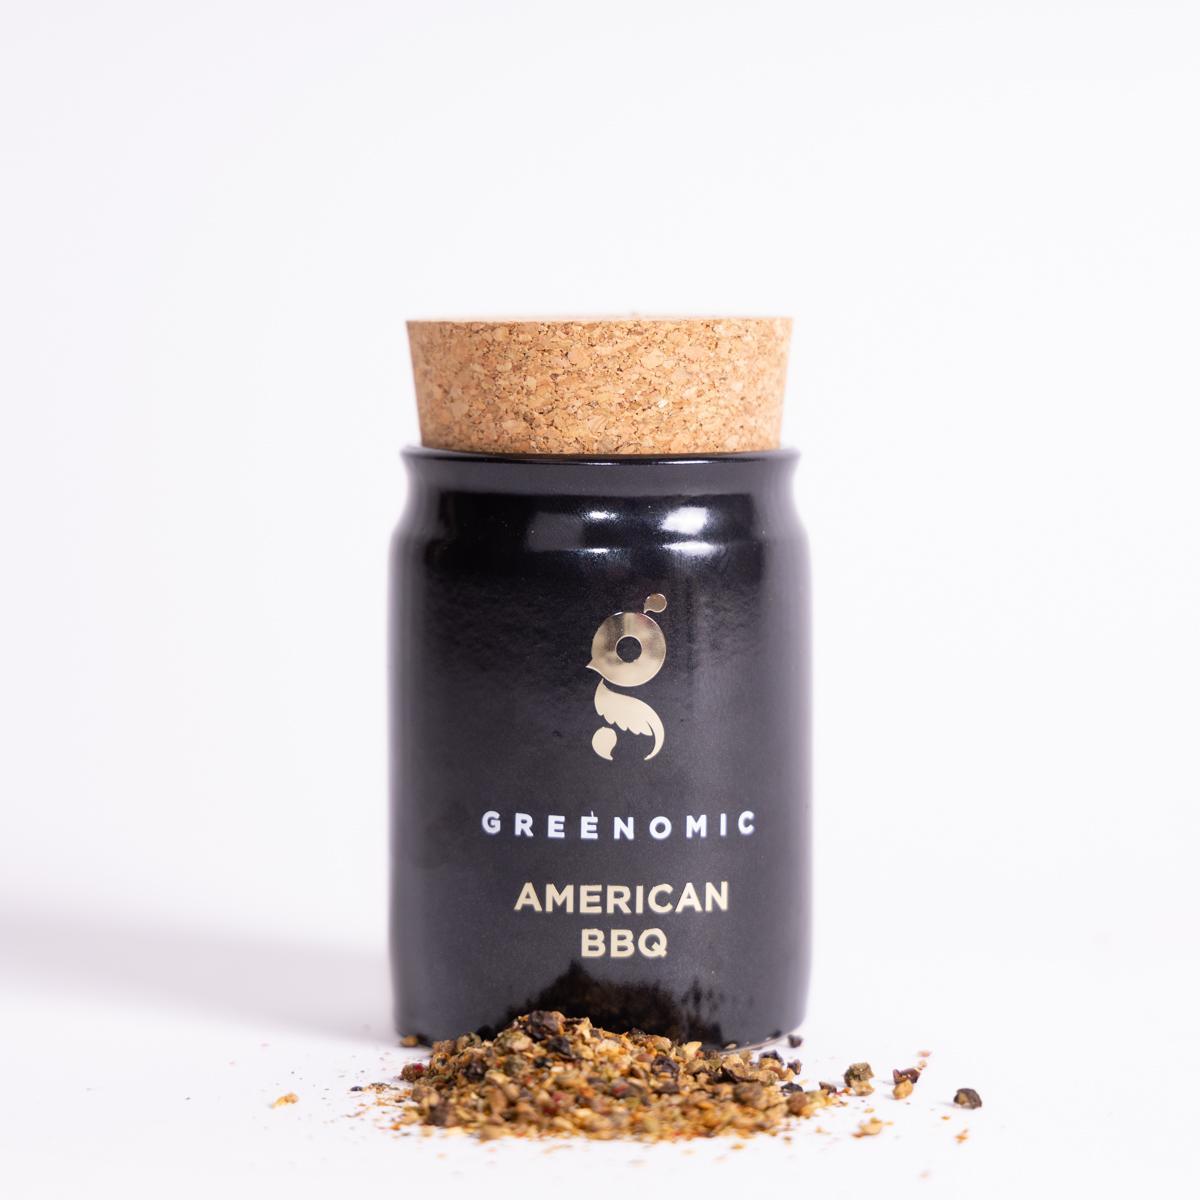 Spezie da Barbecue American BBQ Greenomic